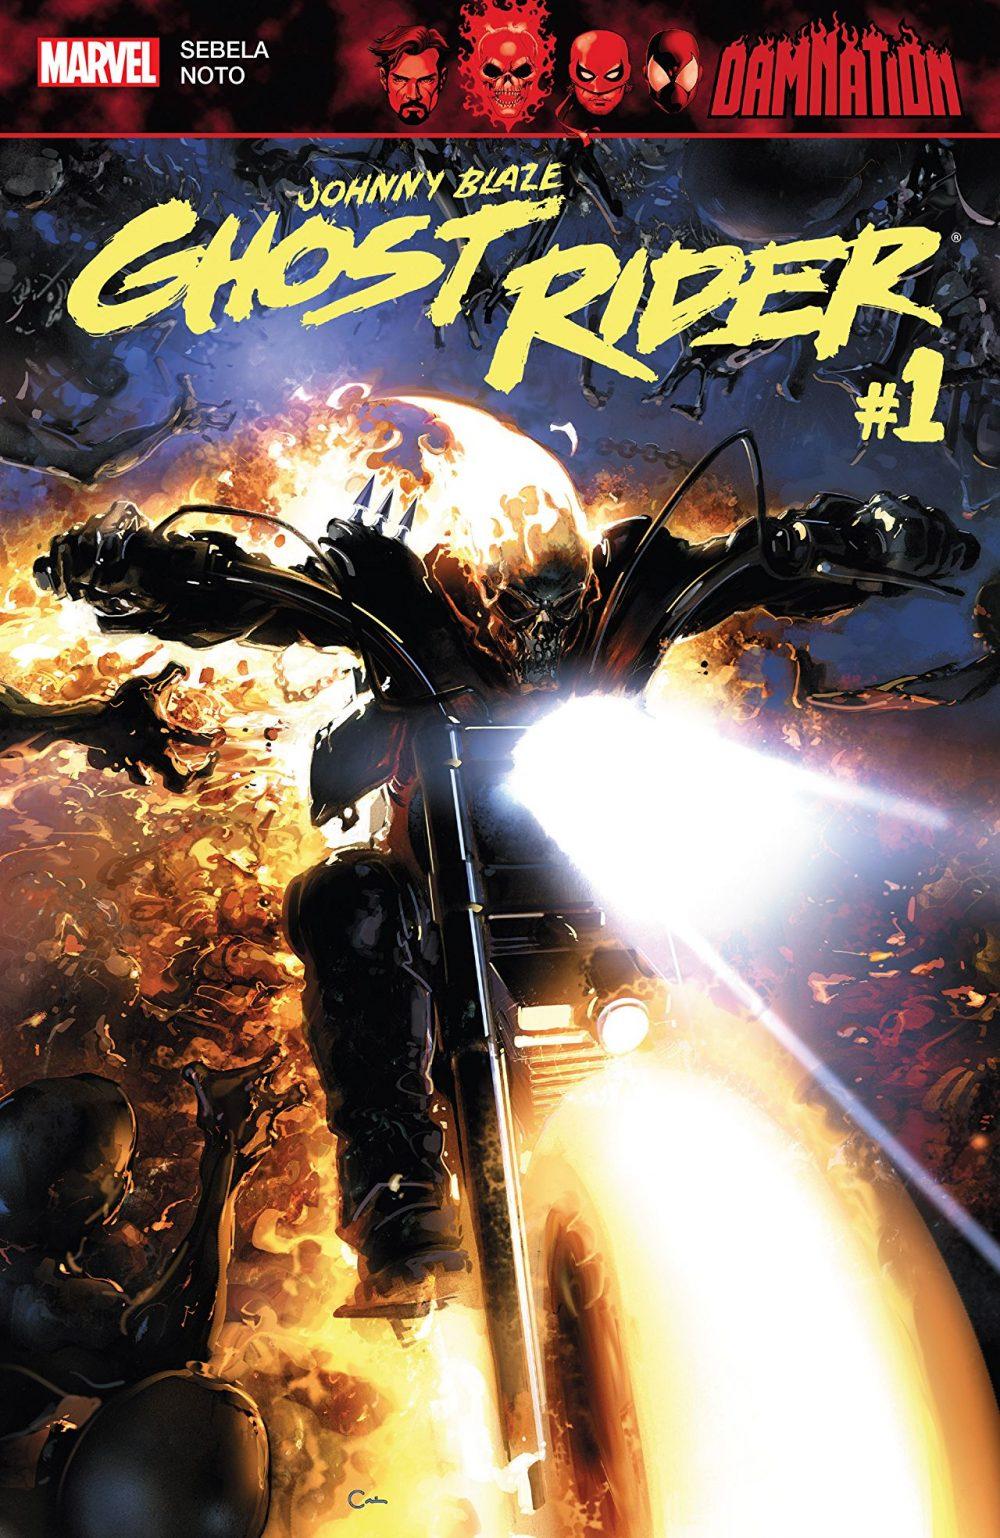 Damnation - Johnny Blaze: Ghost Rider #1, copertina di Clayton Crain